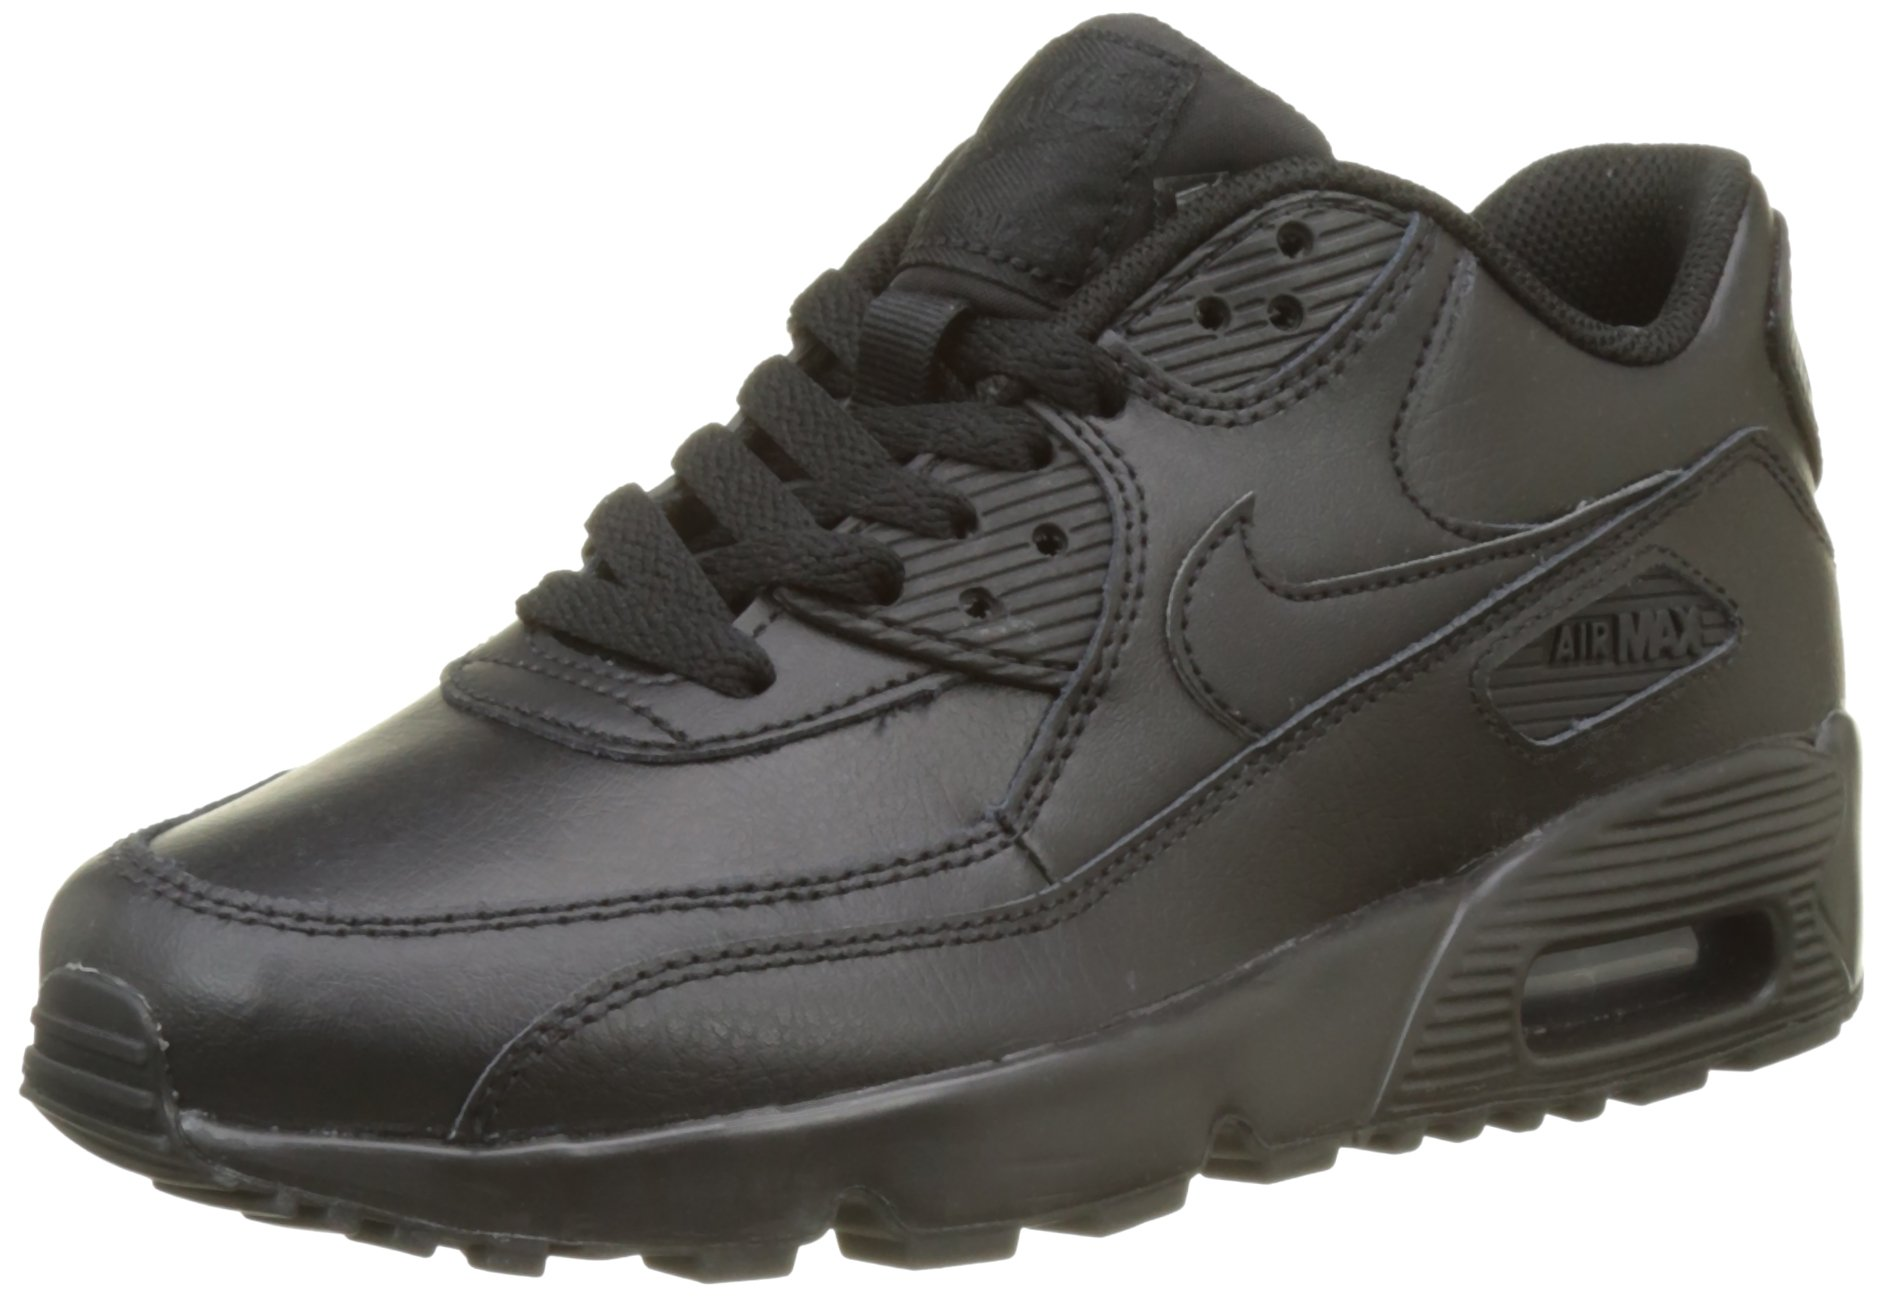 Nike 833412-001 Kid's Air Max 90 Leather Running Shoes, Black/Black, 4 M US Big Kid